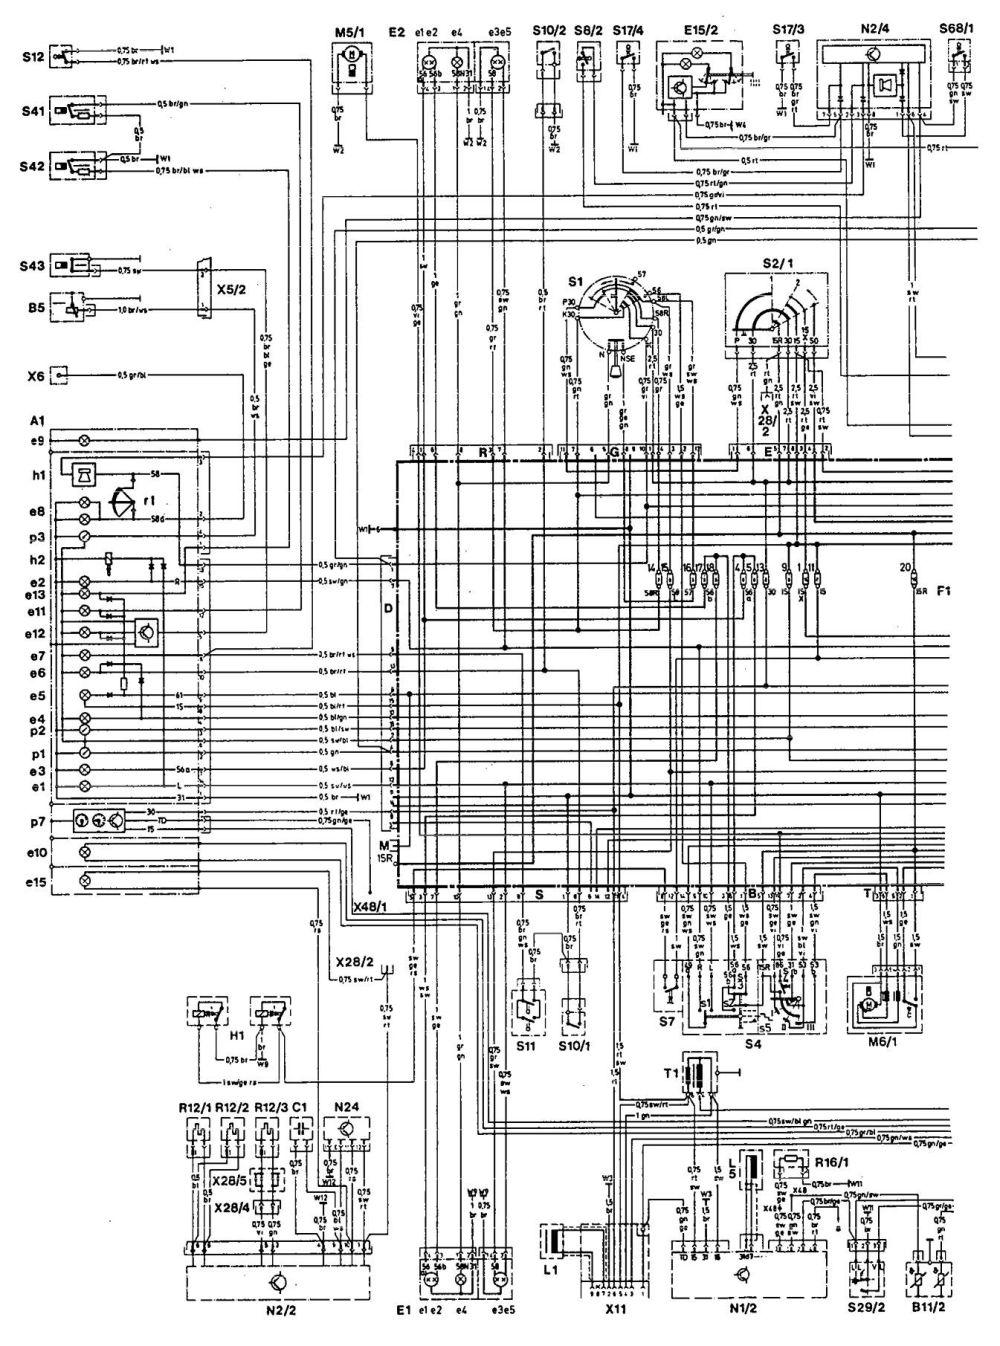 medium resolution of 1993 mercedes benz 190e wiring diagram wiring diagrams data wiring diagram mercedes 300sd mercedes 190e